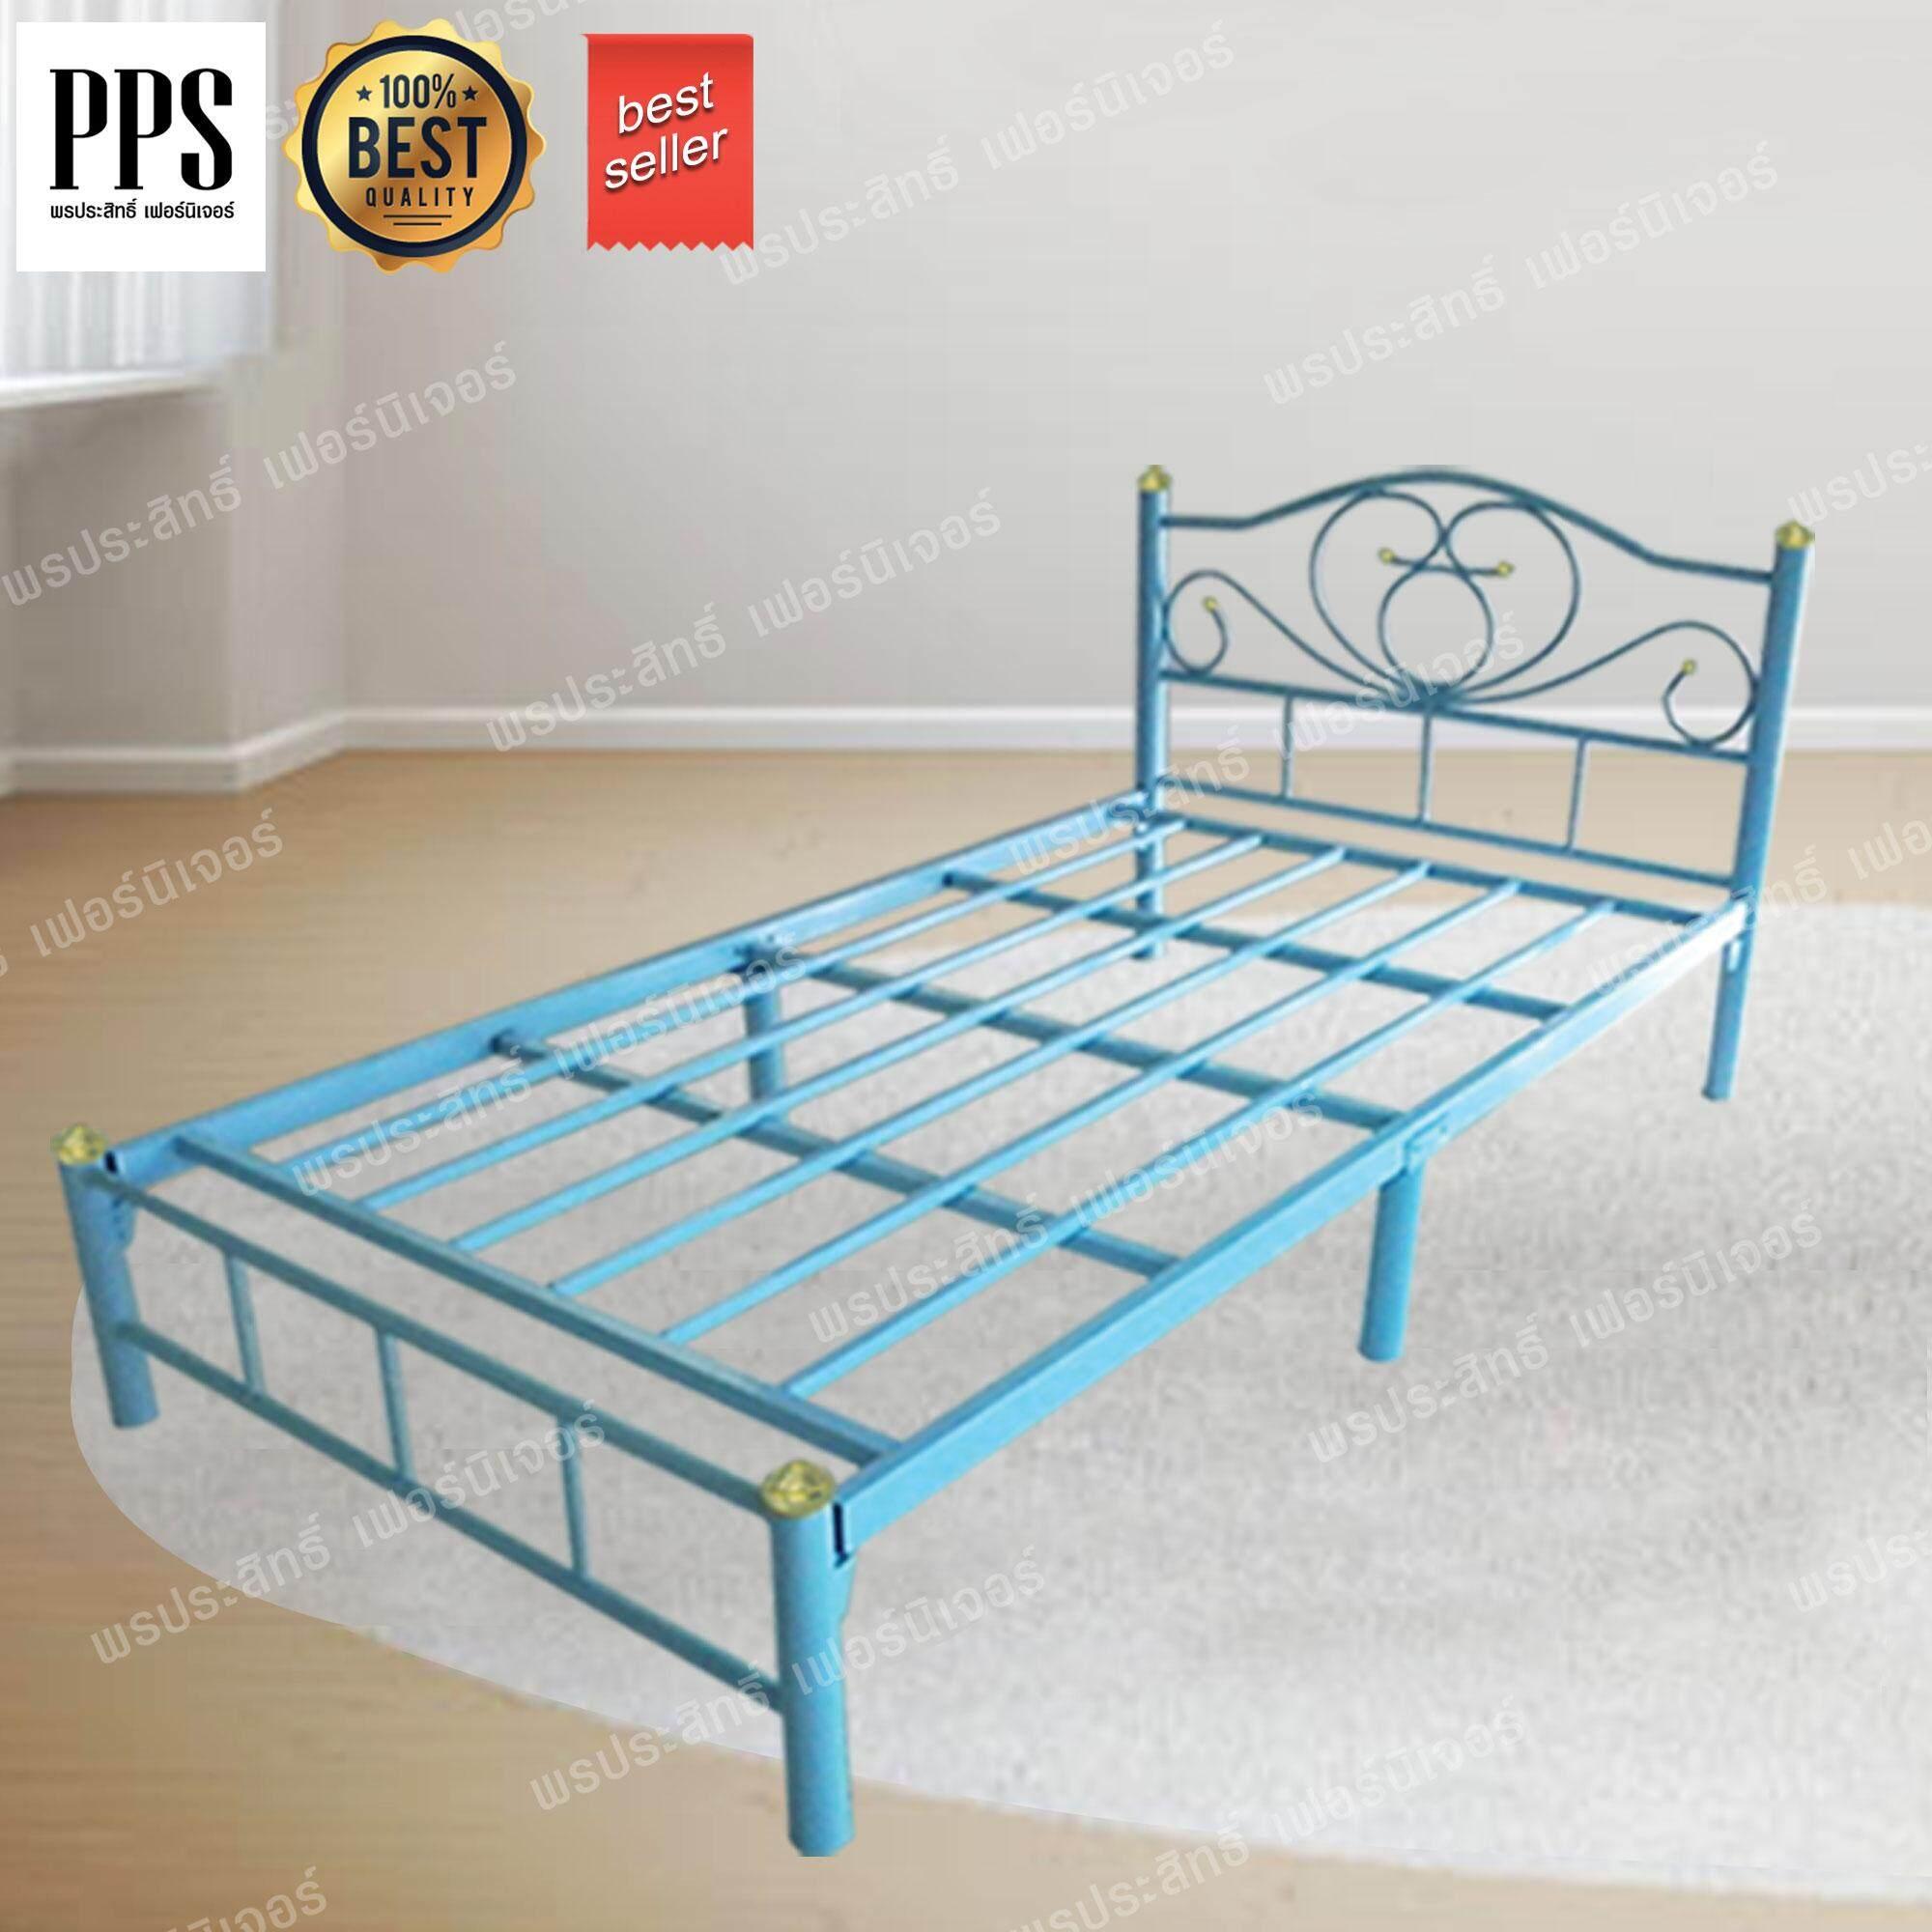 Asia เตียงเหล็ก3.5ฟุต ขา2นิ้ว รุ่นโลตัส (สีฟ้า).